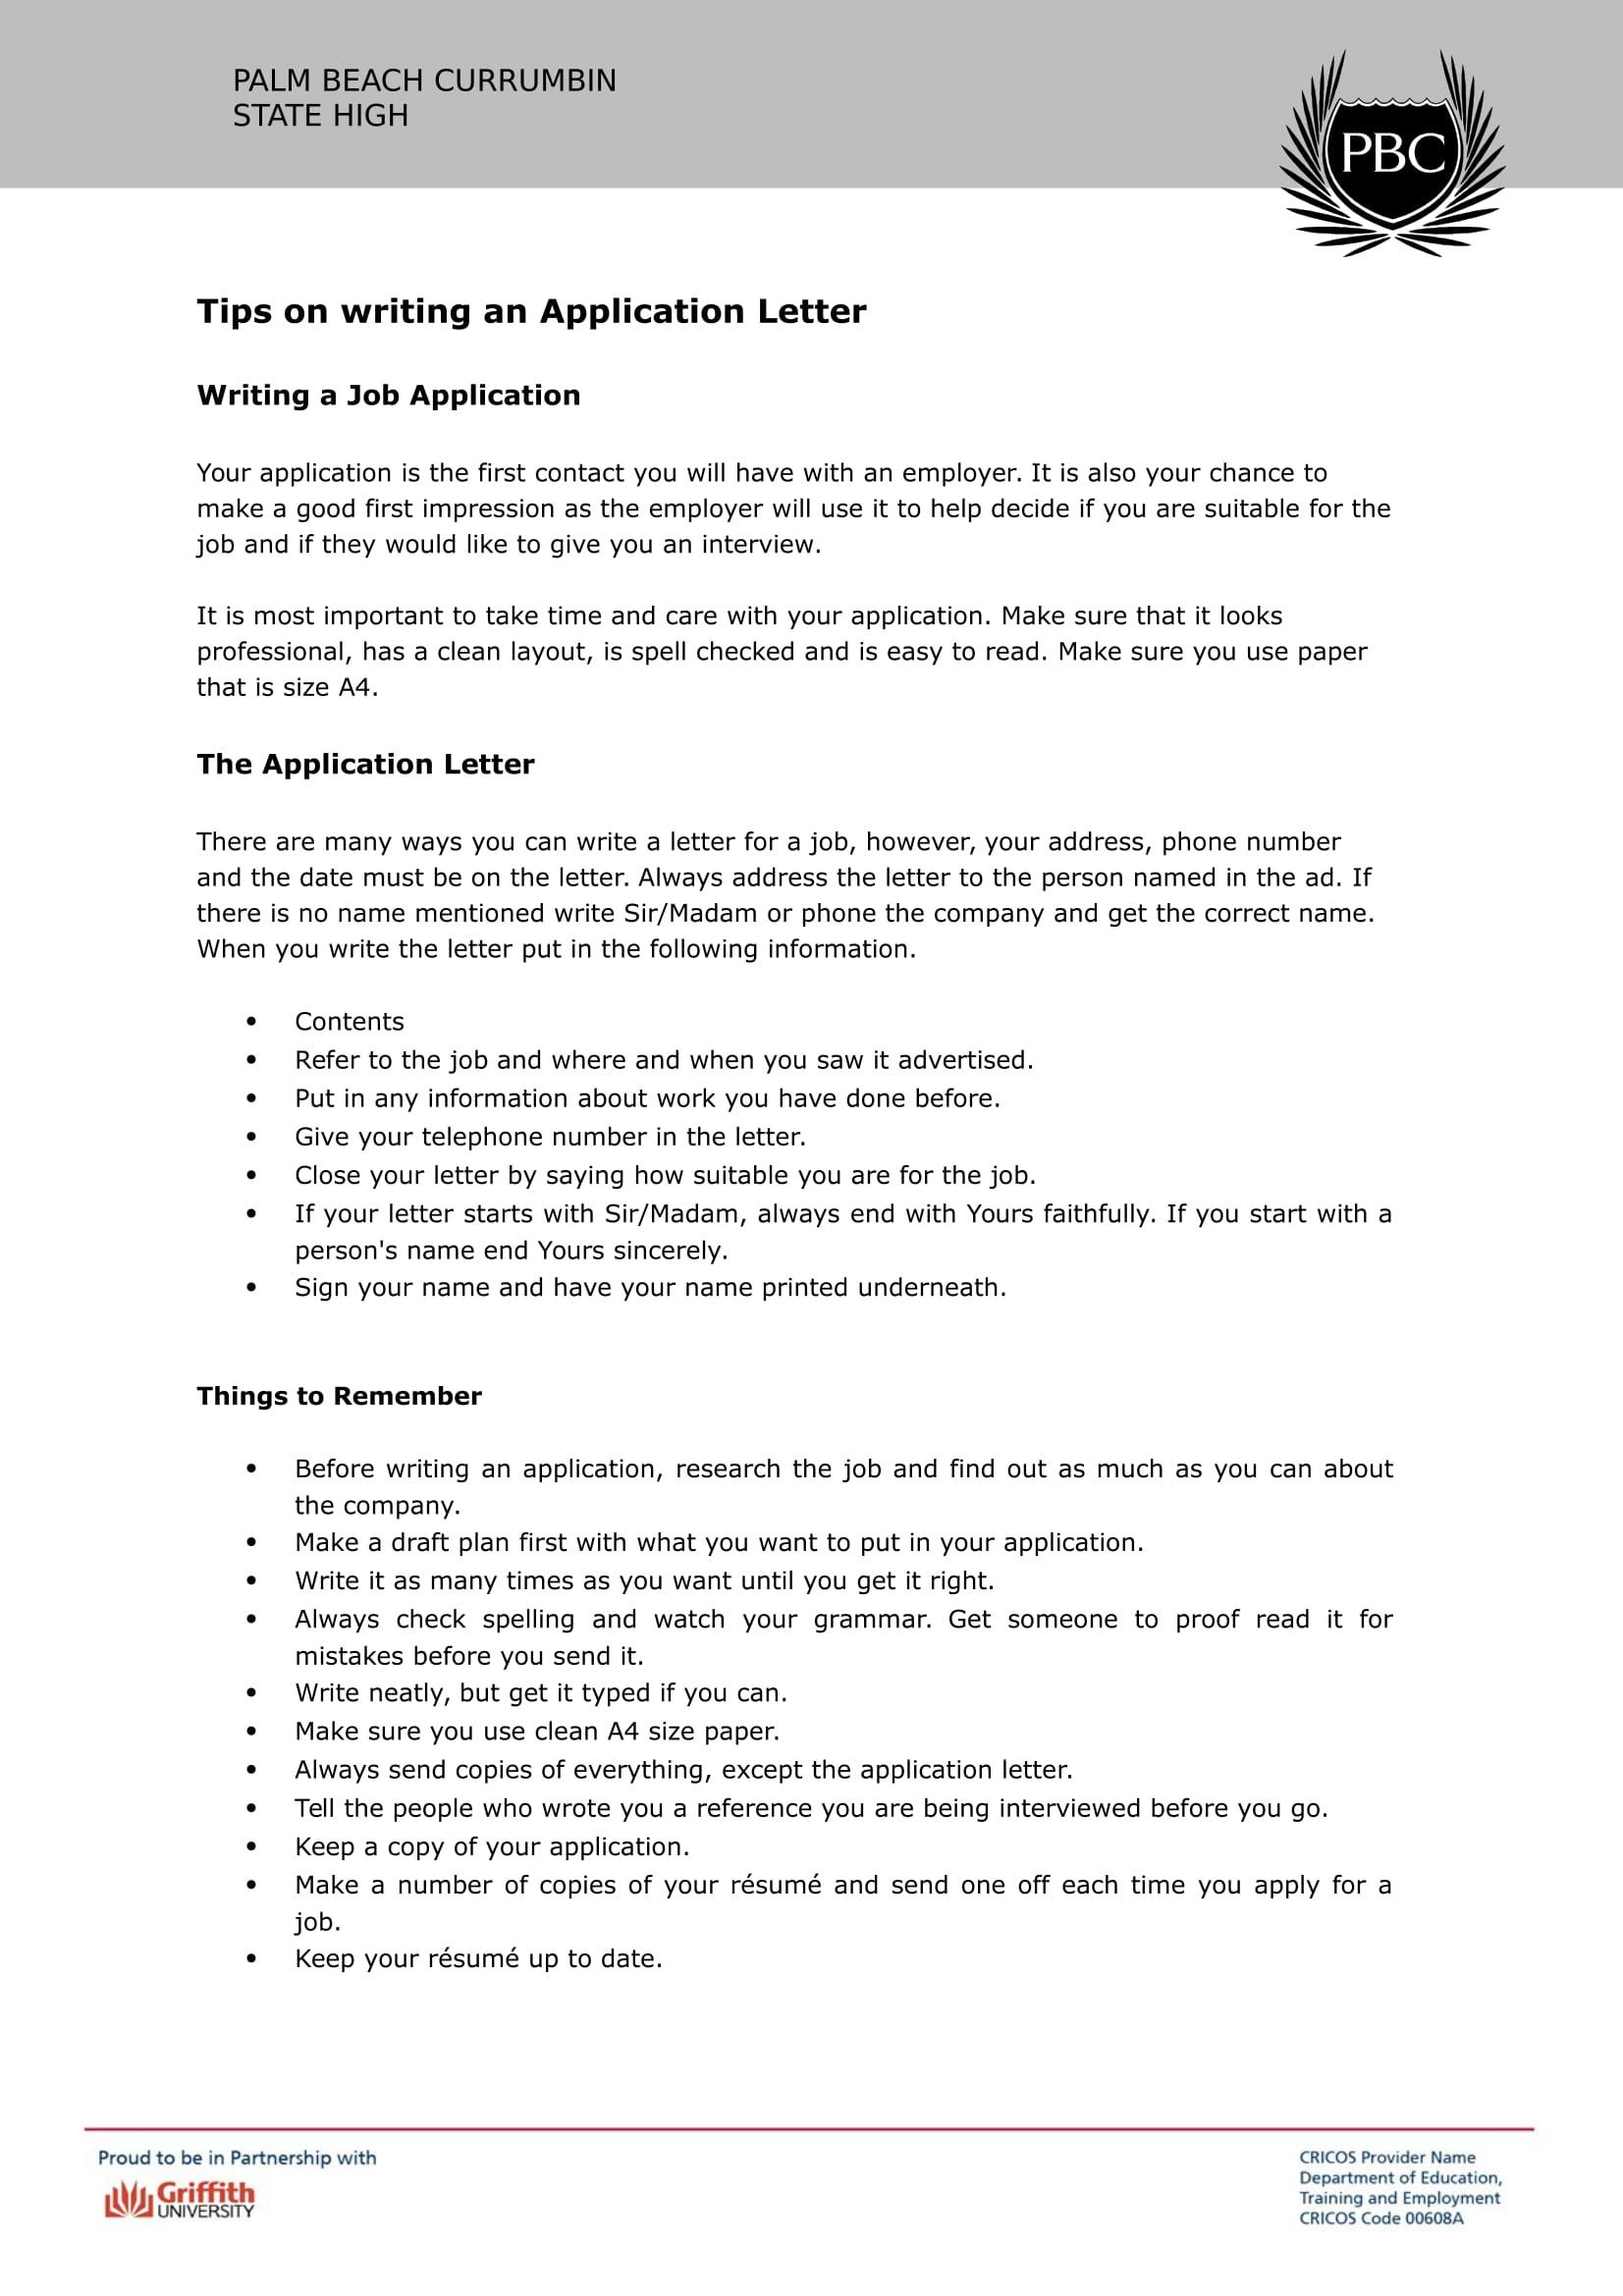 Application Letter Tips 1